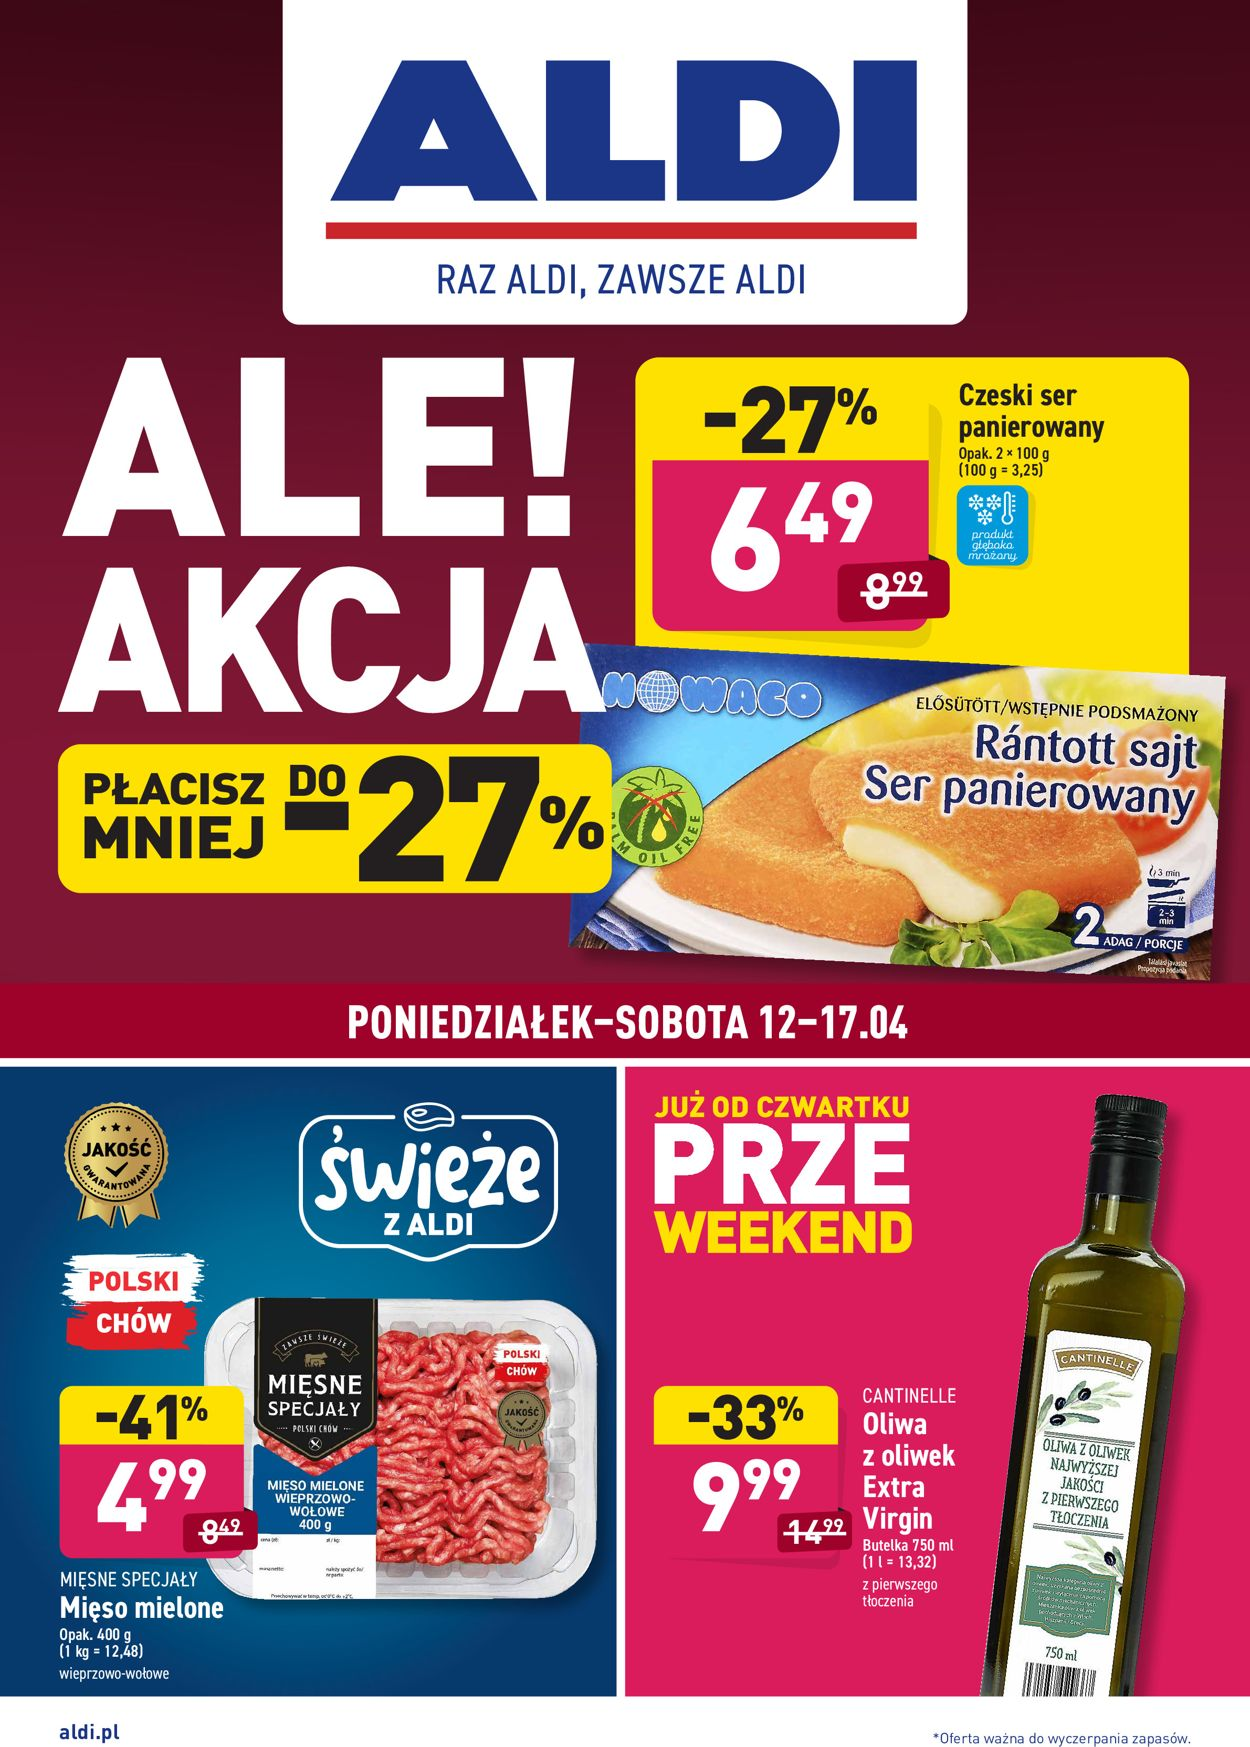 Gazetka promocyjna ALDI - 12.04-17.04.2021